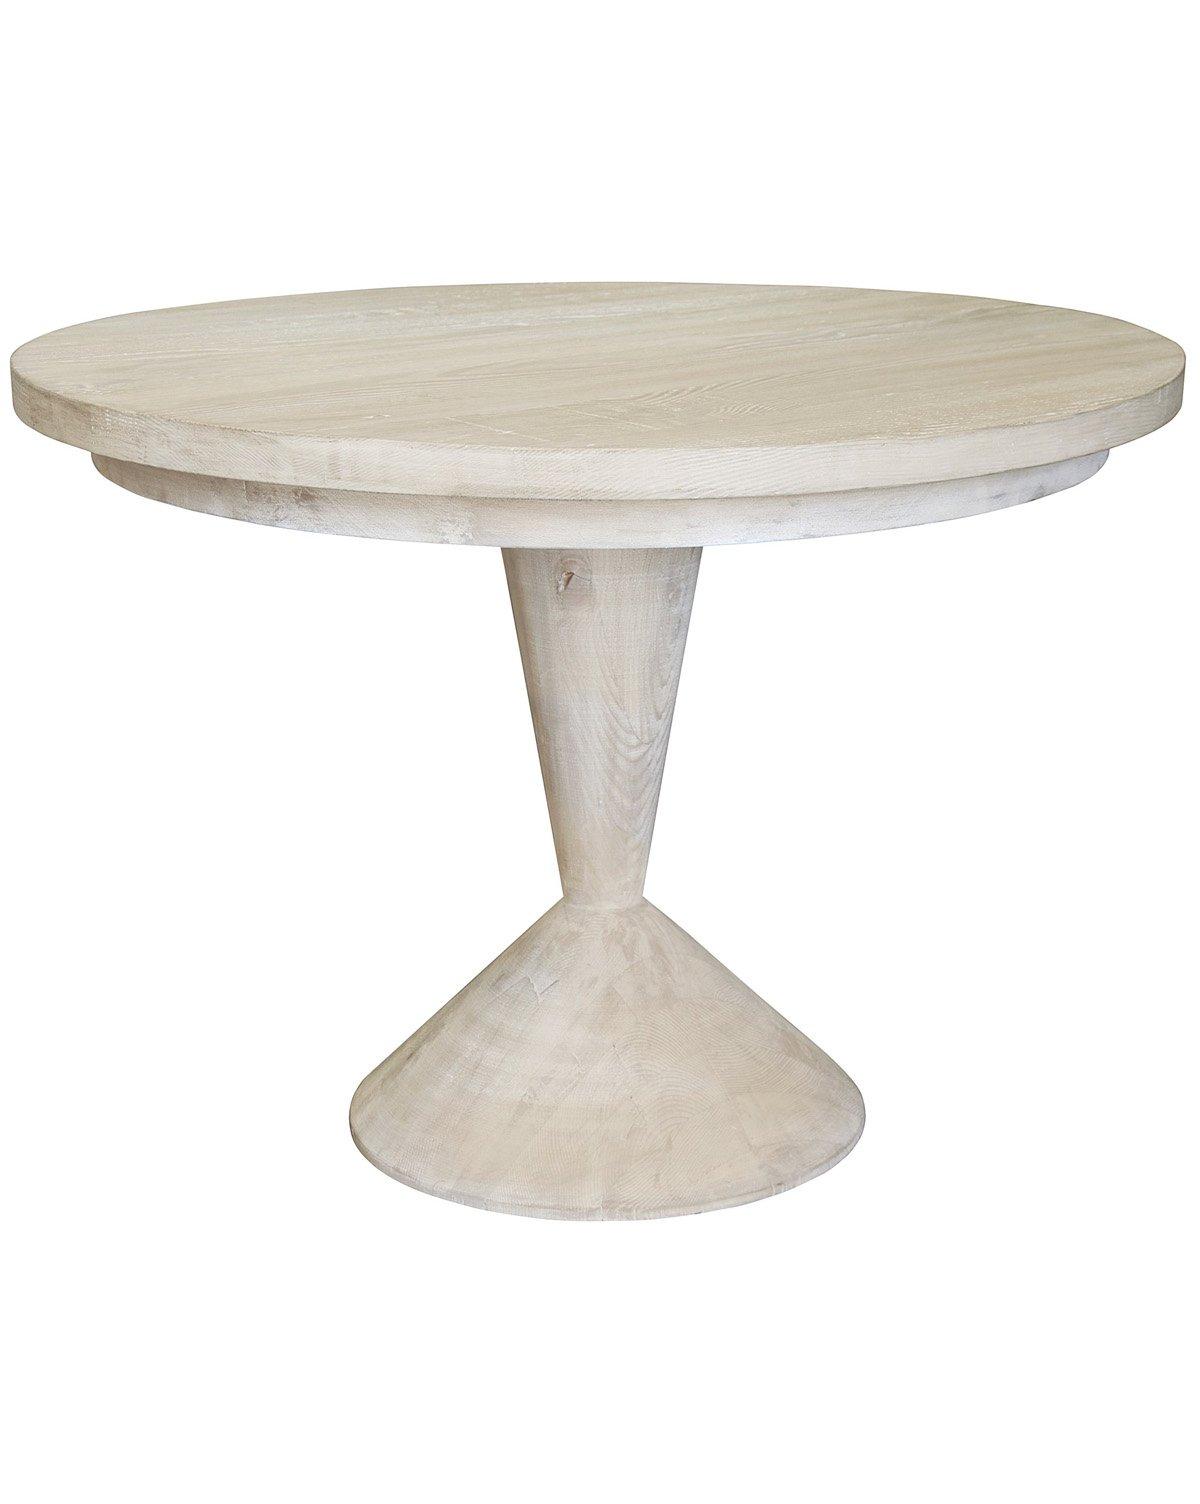 Masa_Table_1.jpg